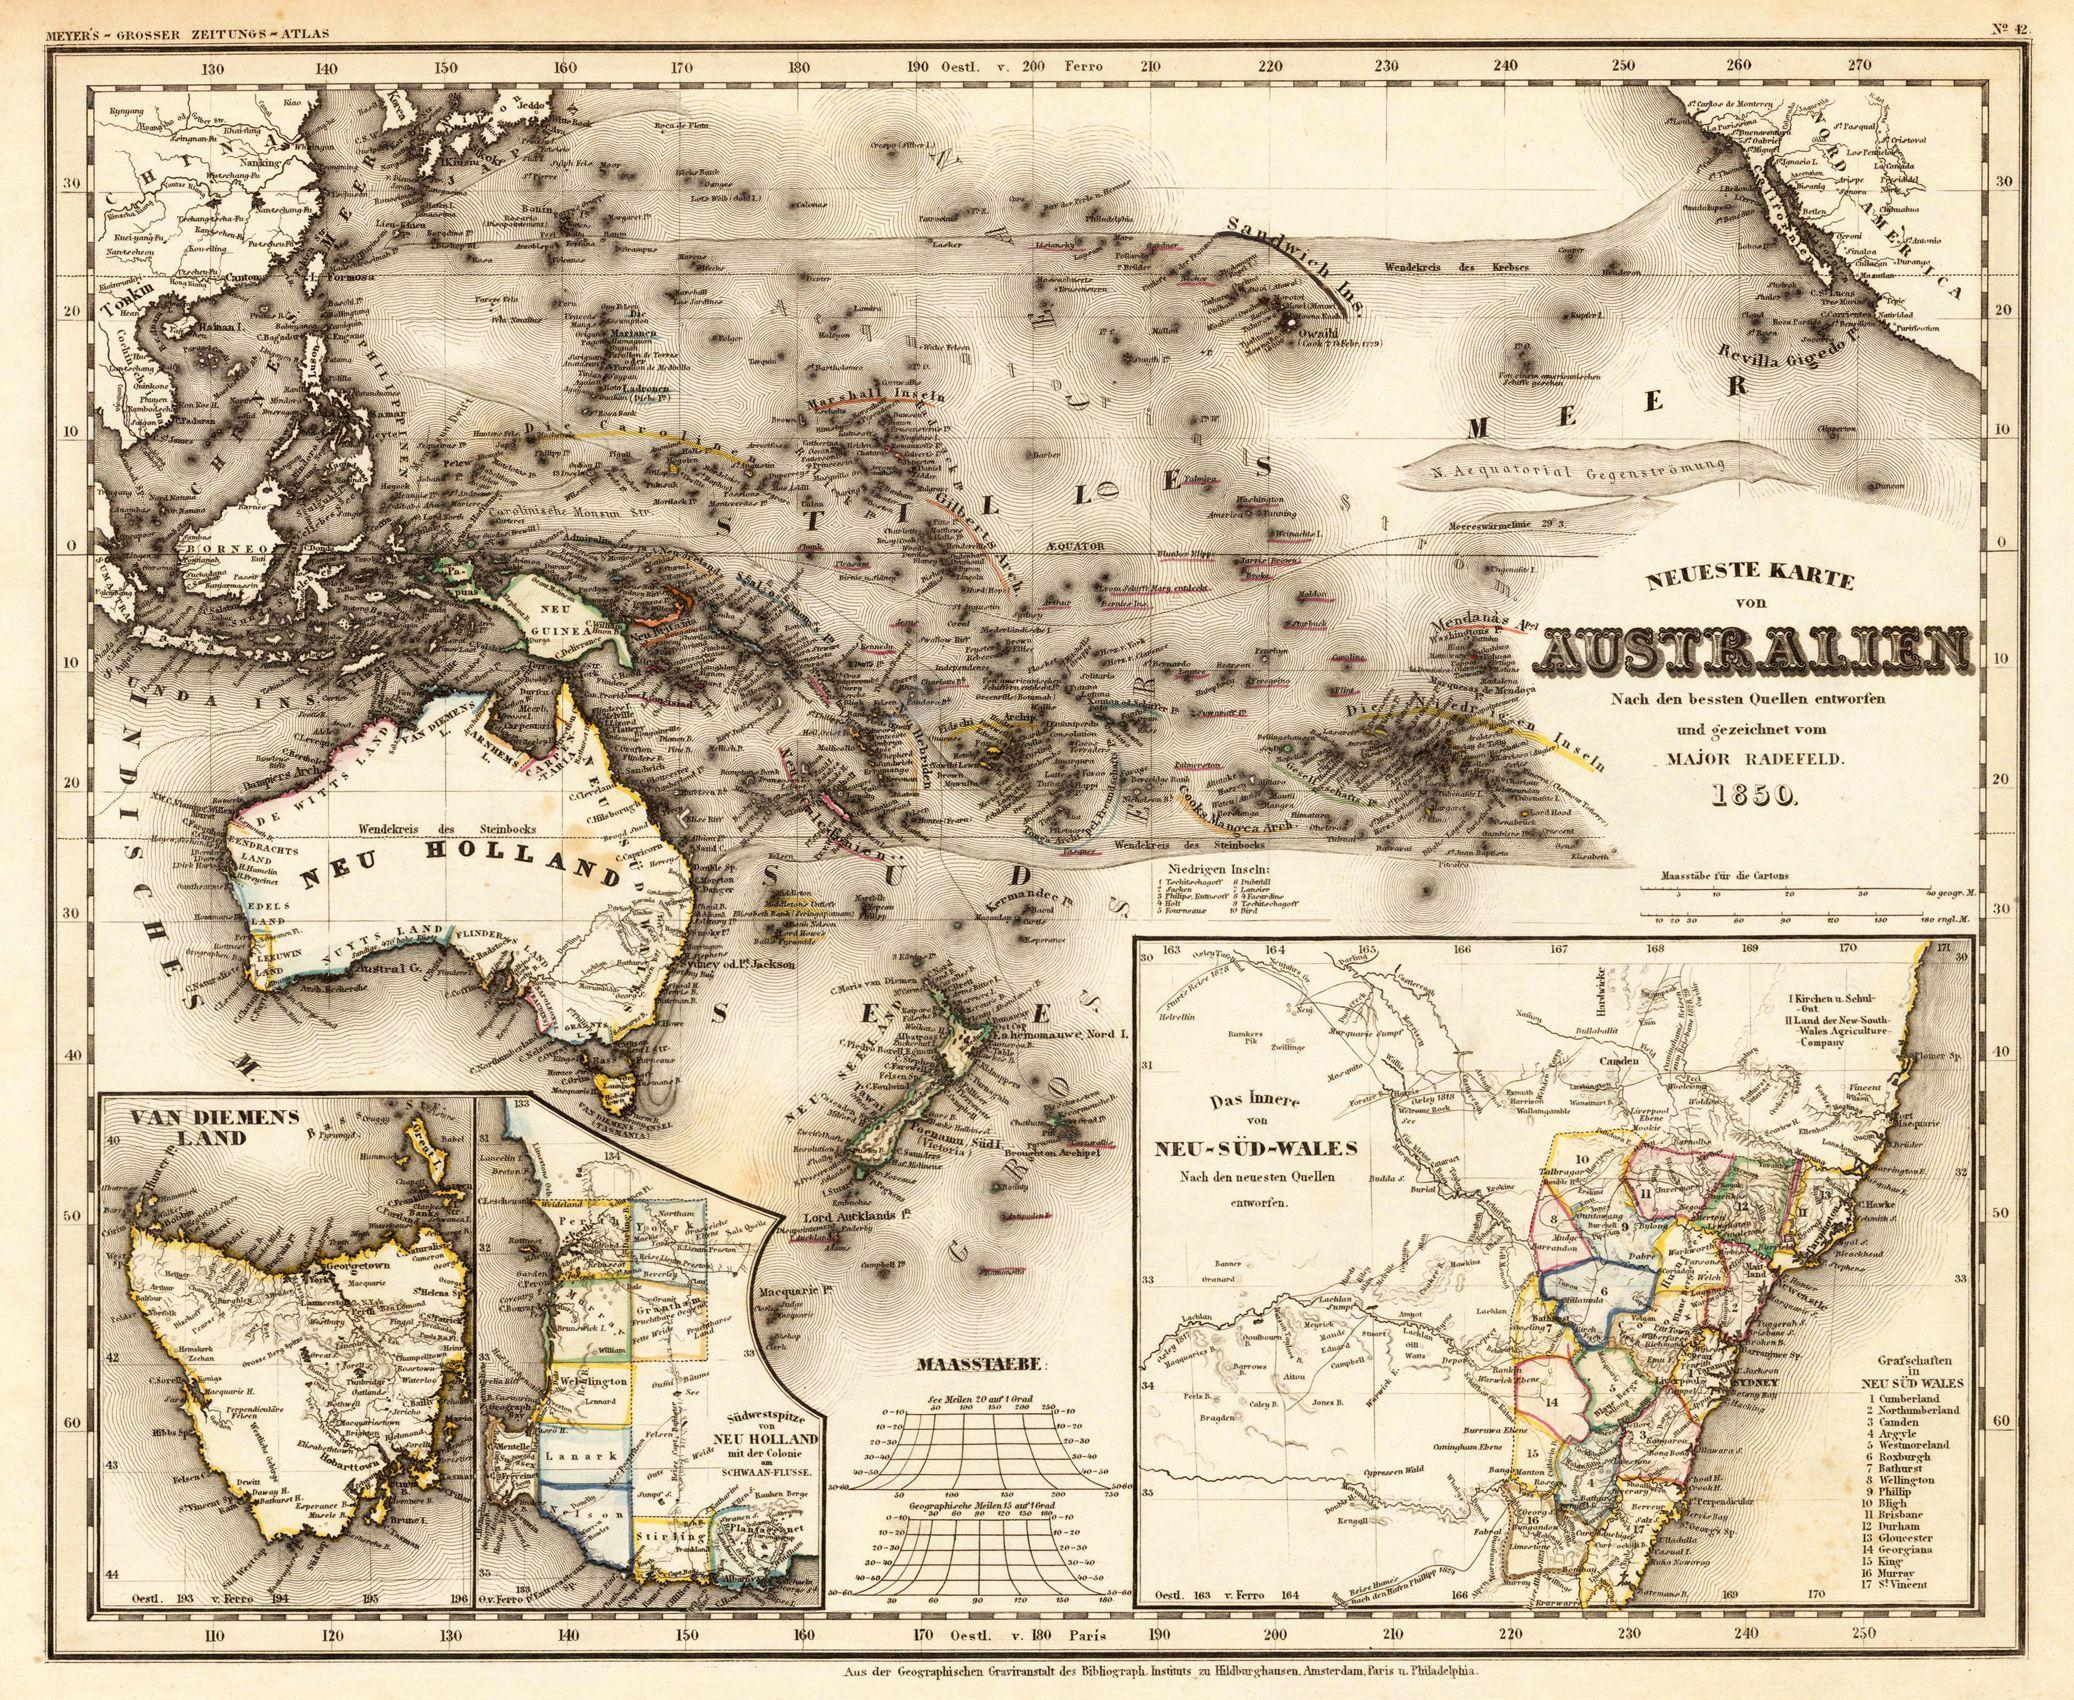 Australia Map 1850.1850 Australia Radefeld Antique Maps And Prints Mapas